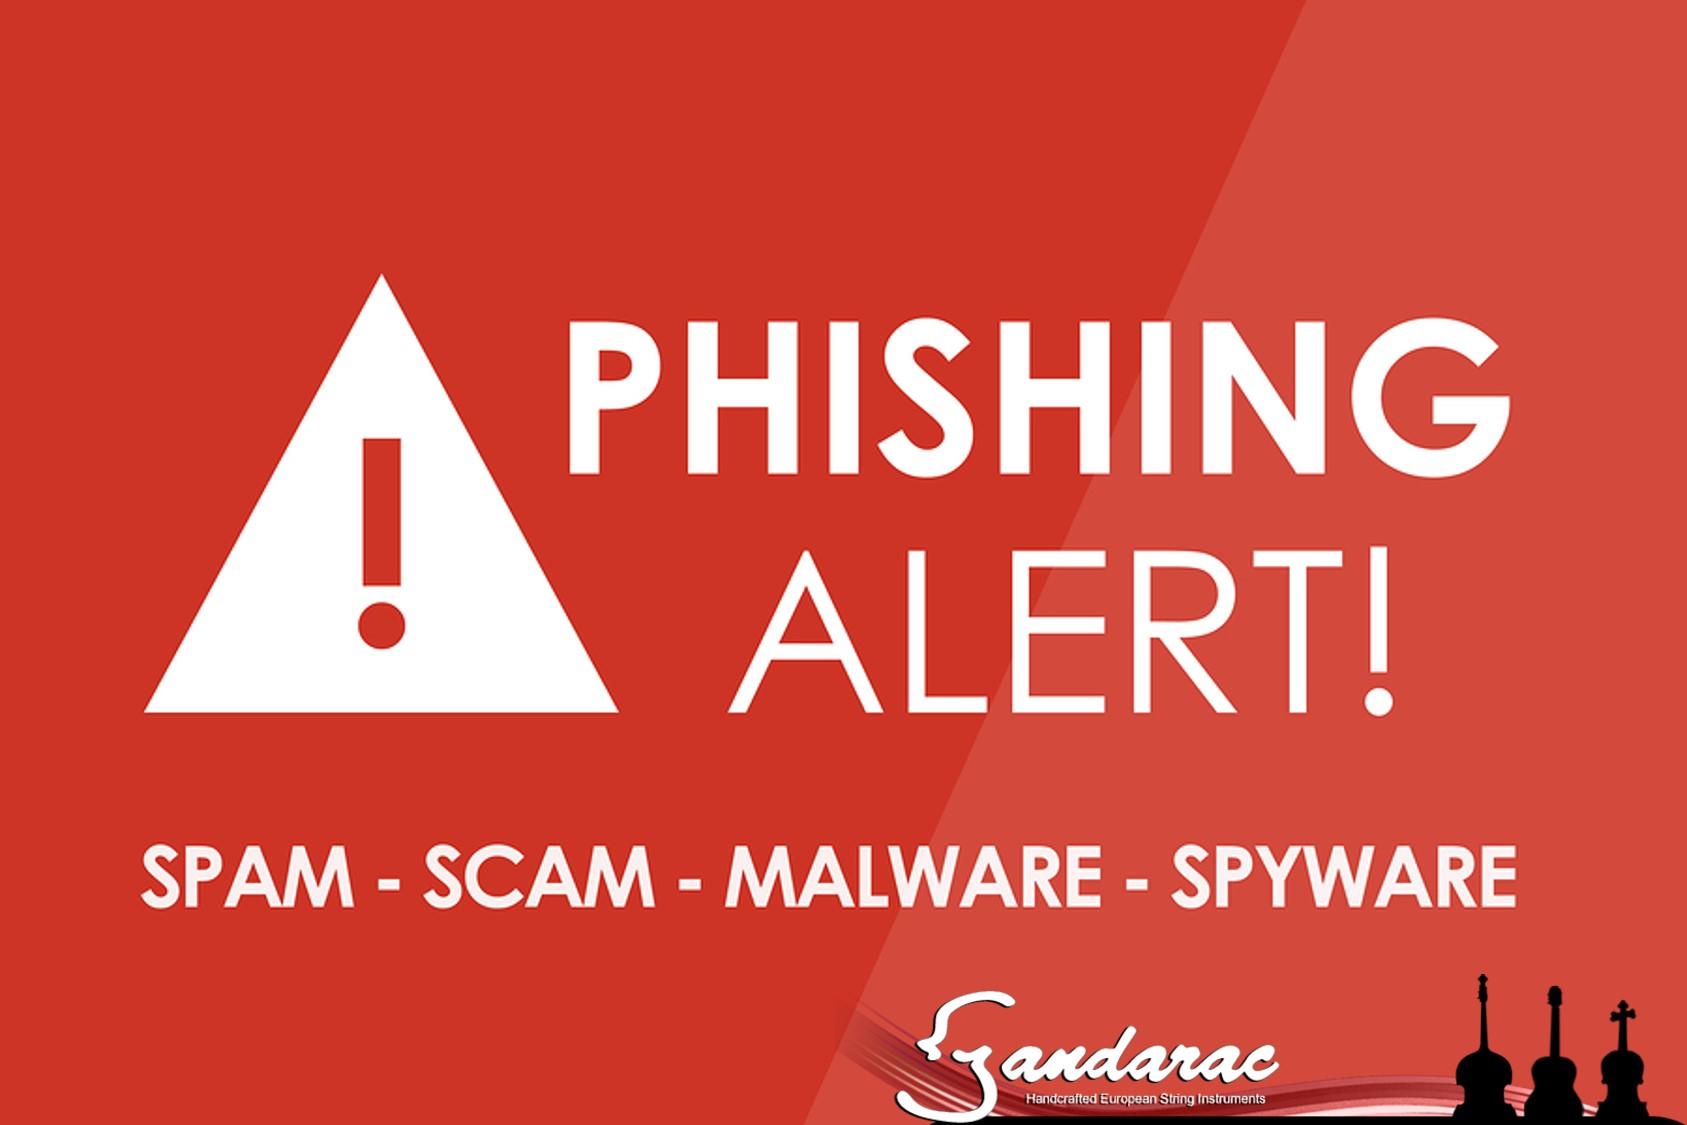 16 - phishing alert